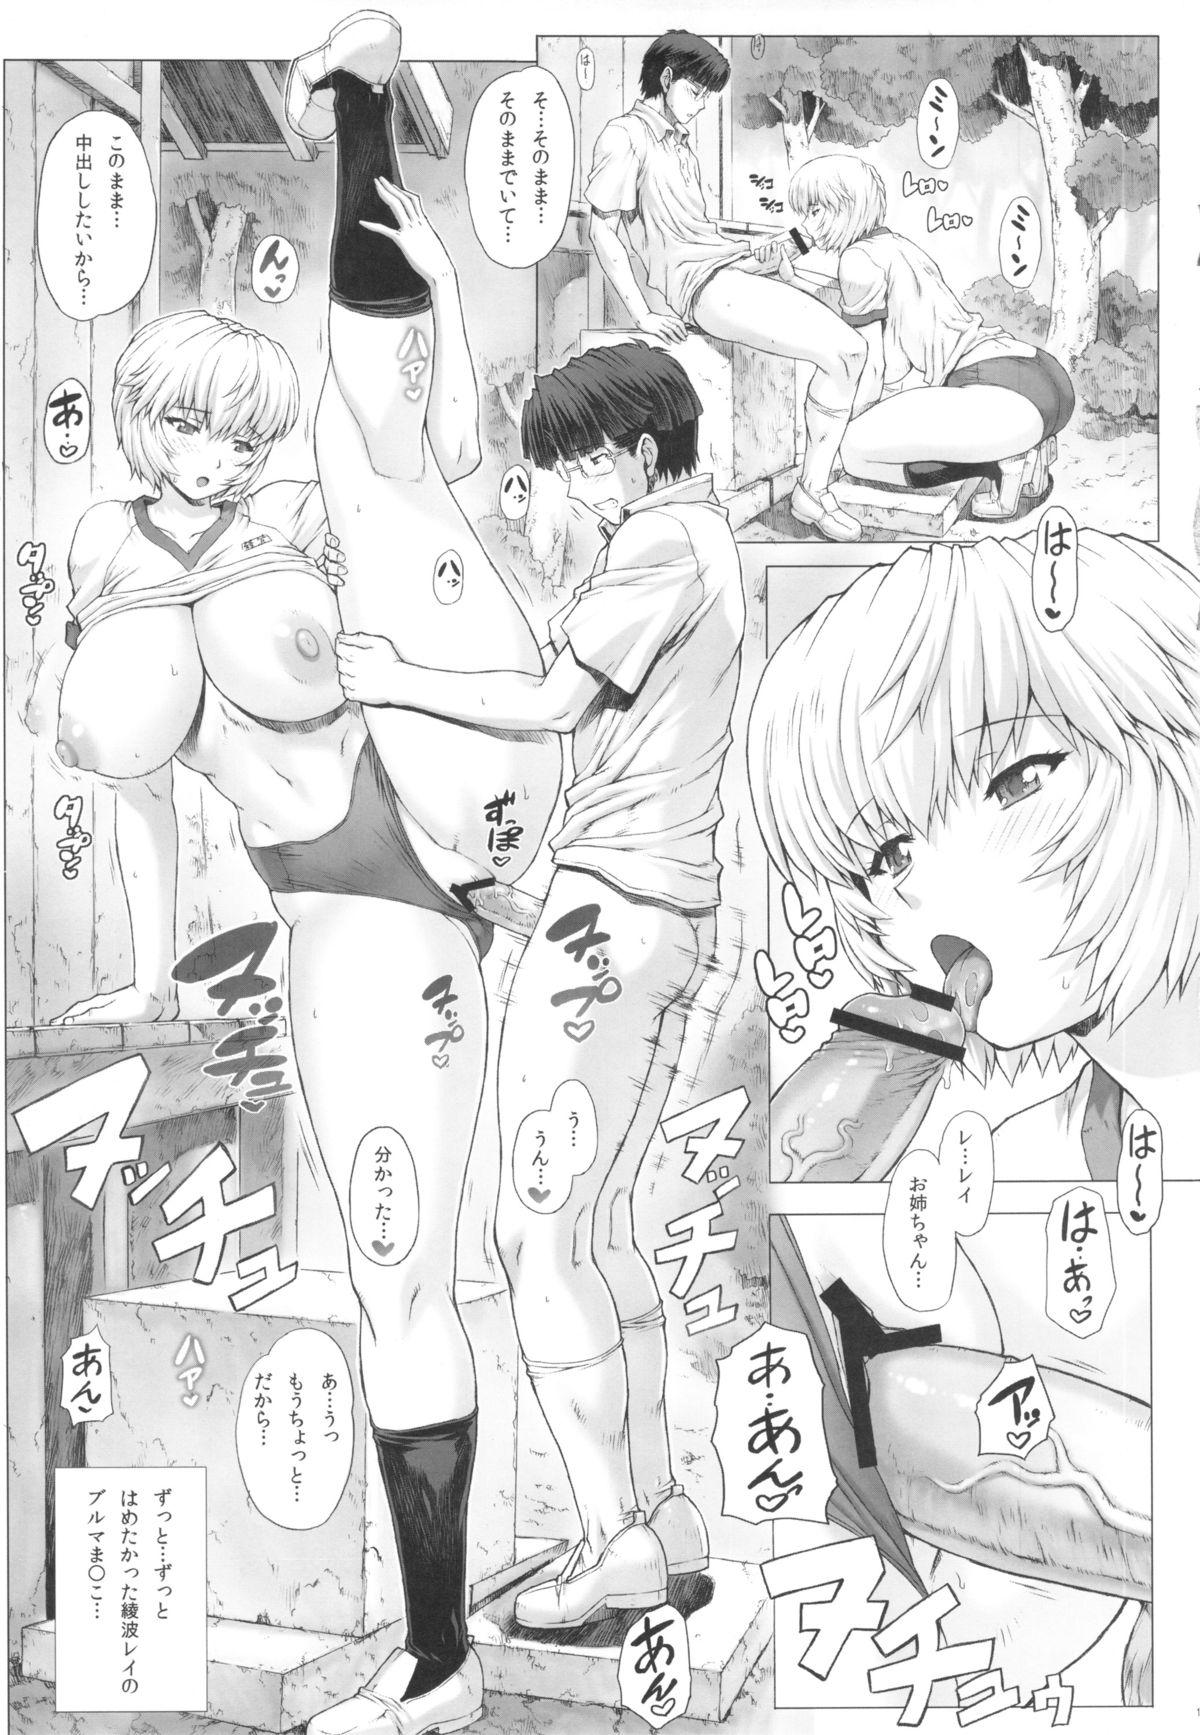 Ayanami Dai 4 Kai + Omake Bon + Postcard 14